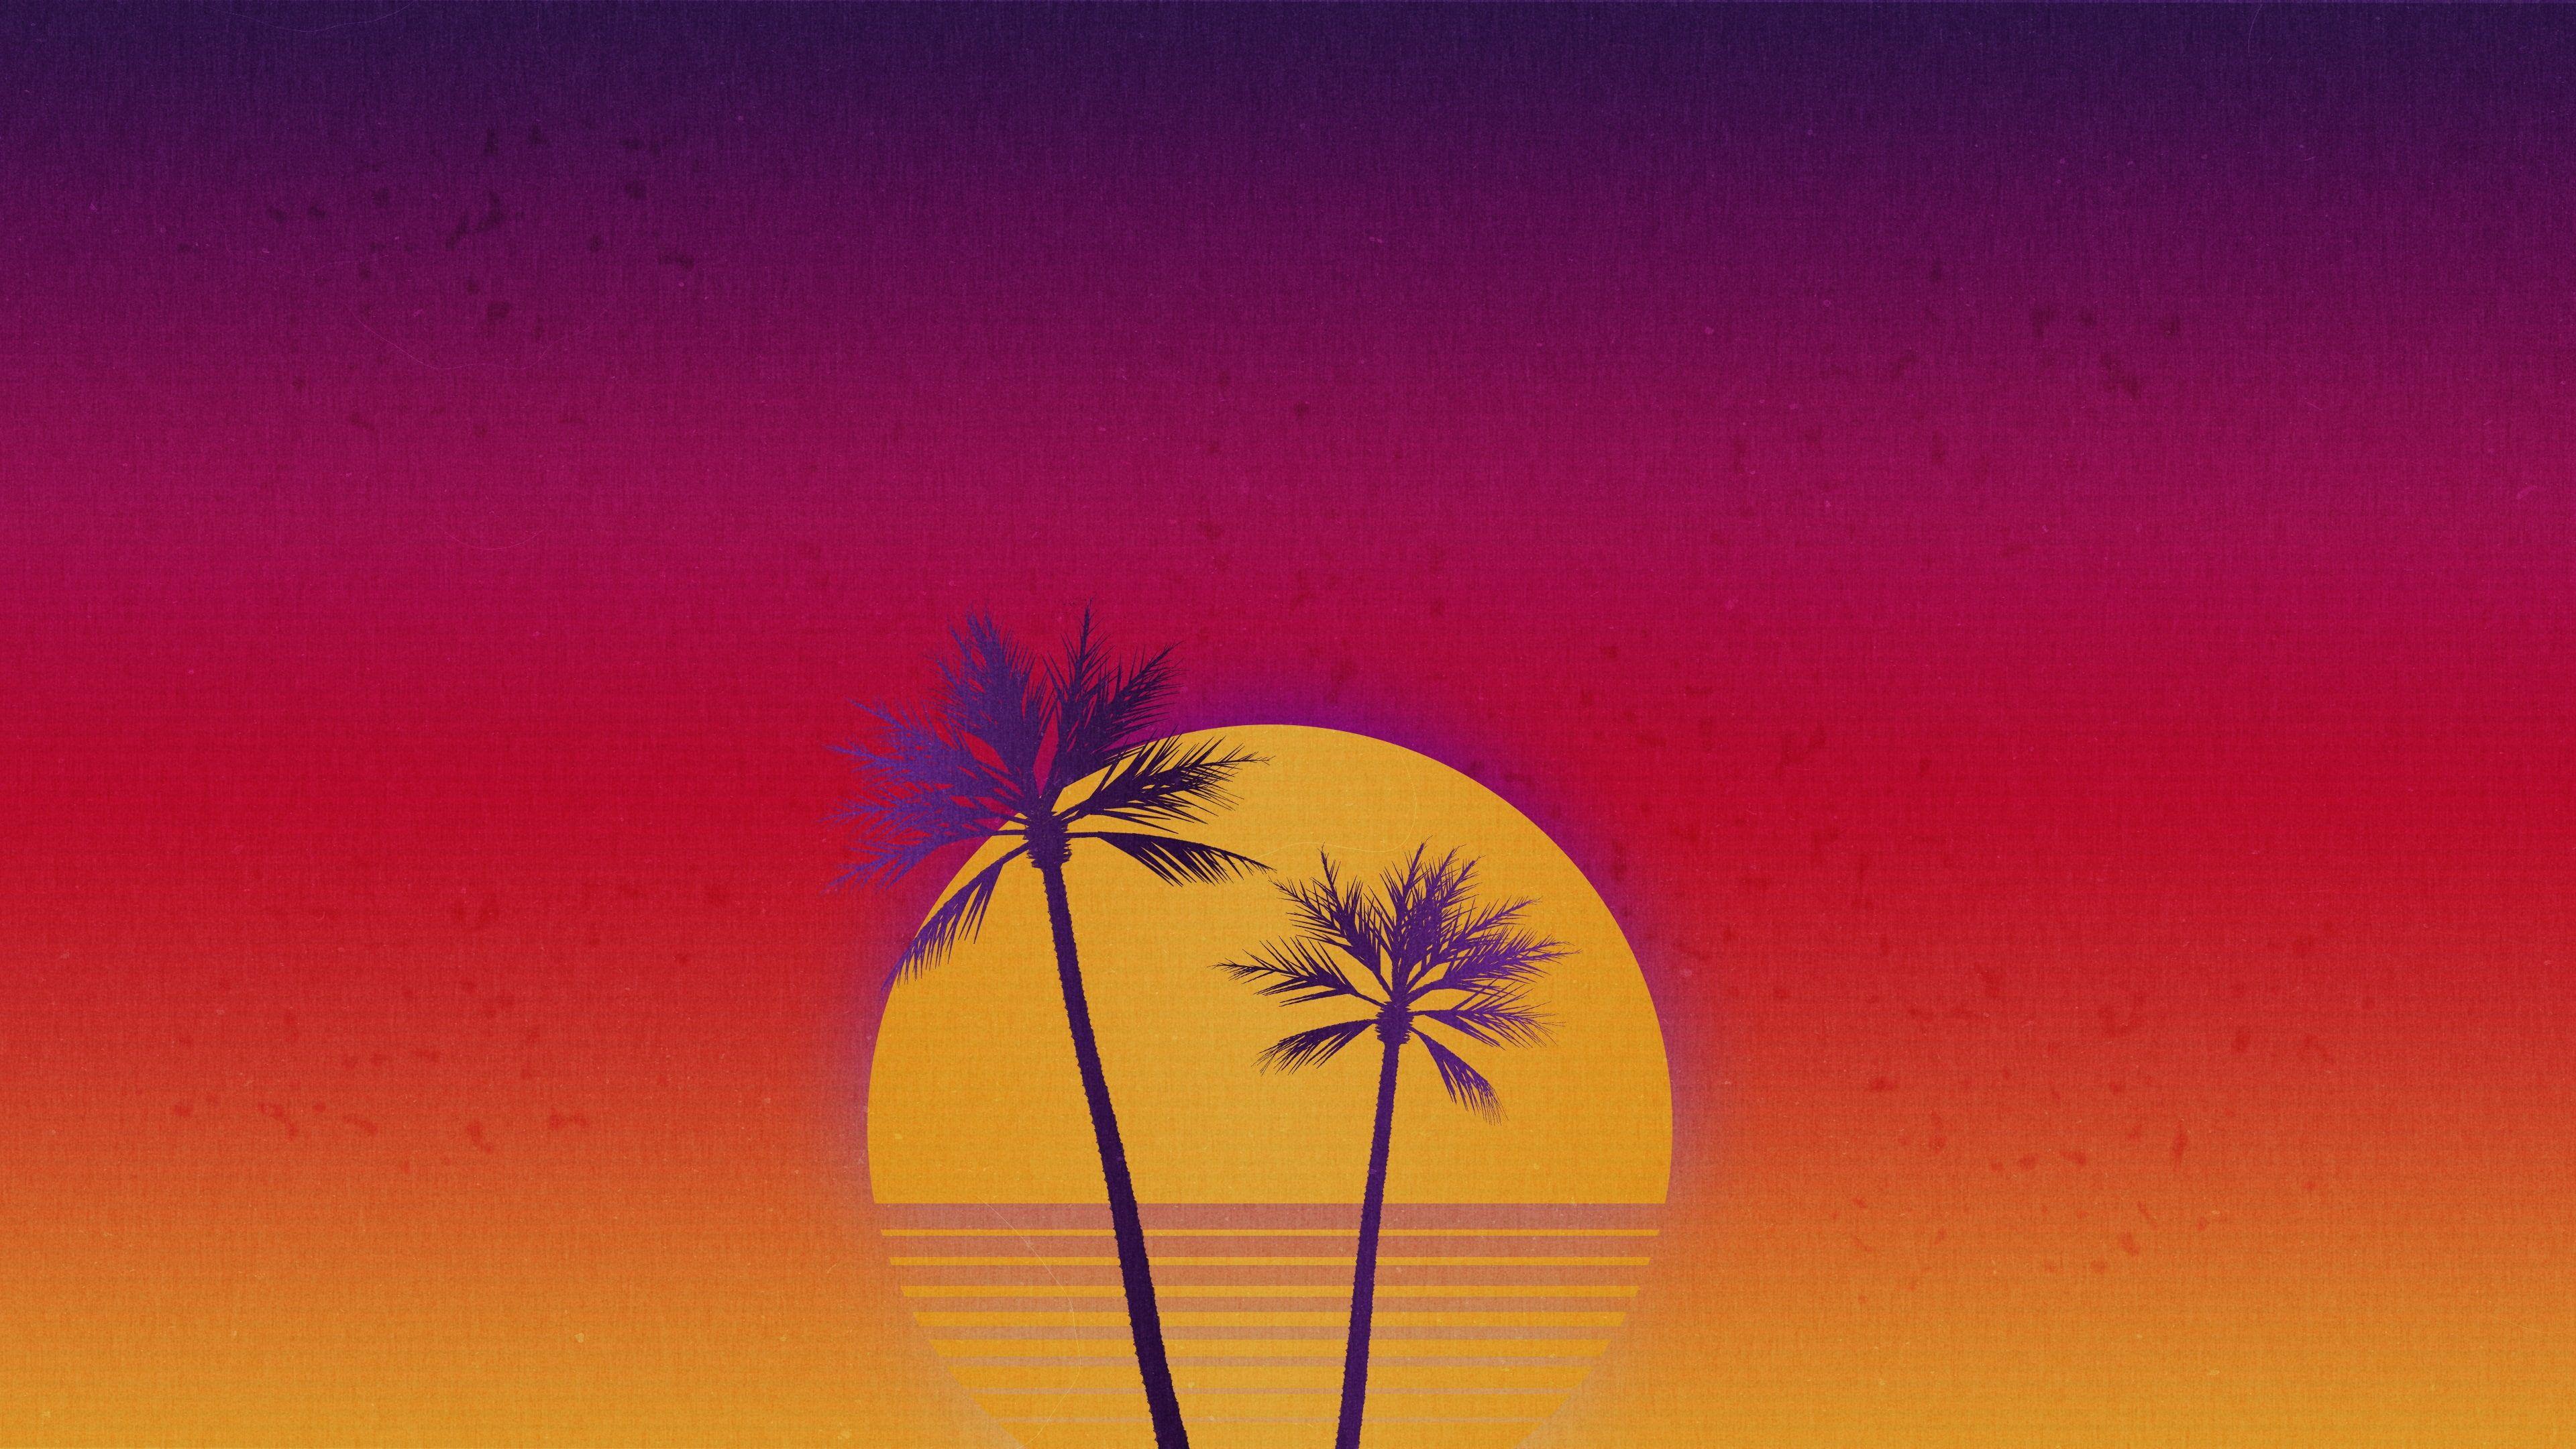 Outrun Sunset Vaporwave Retrowave Retrowave 4k Wallpaper Hdwallpaper Desktop Vaporwave Wallpaper Hd Wallpaper Pink Wallpaper Iphone